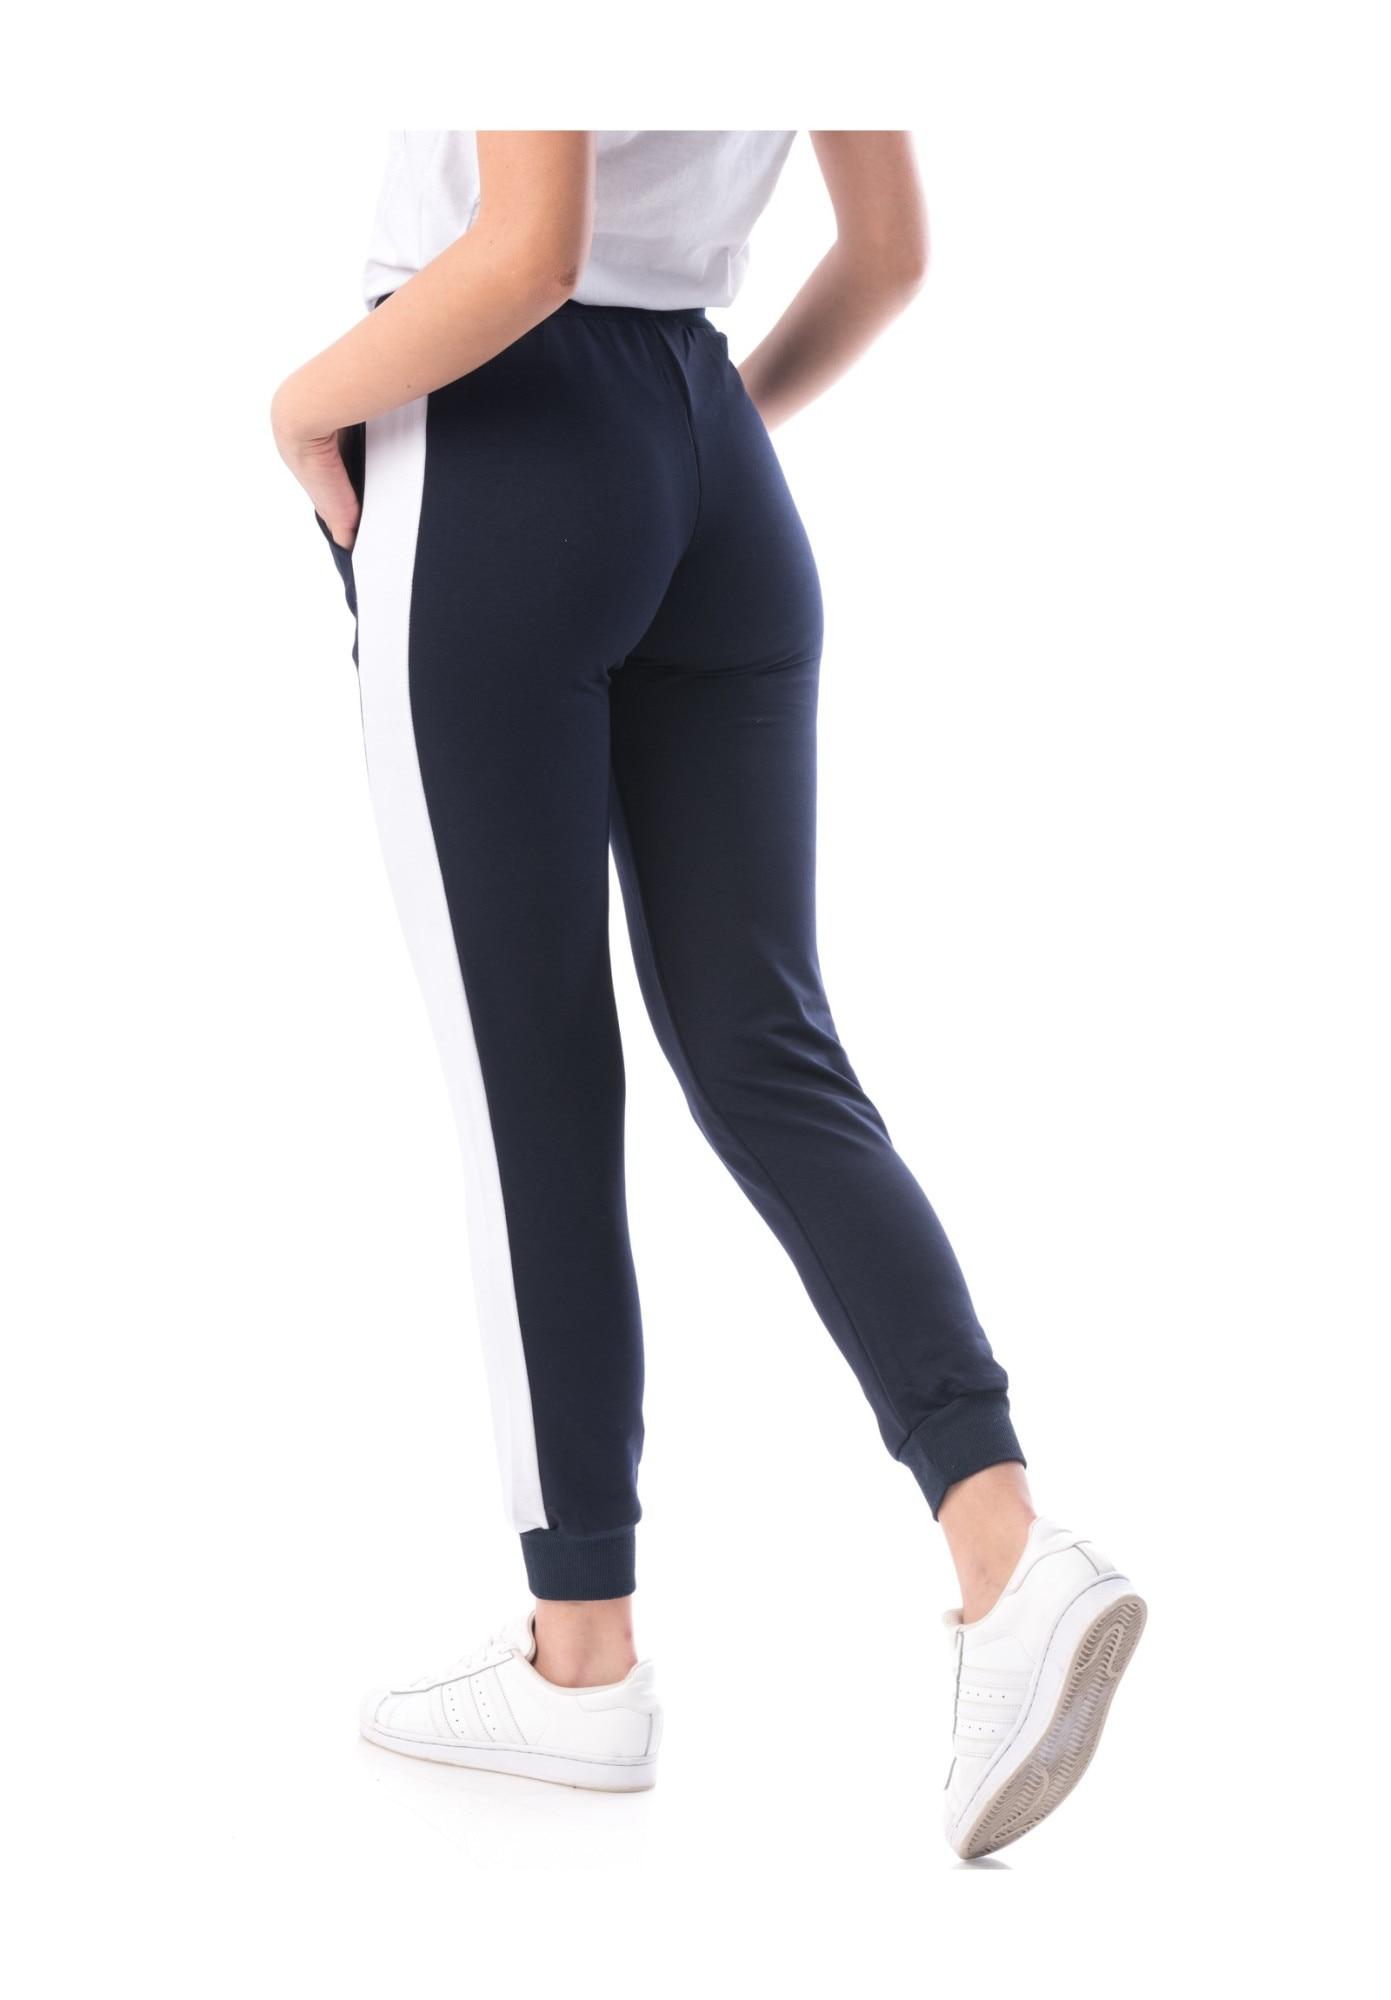 Cauta? i pantaloni de femei albe